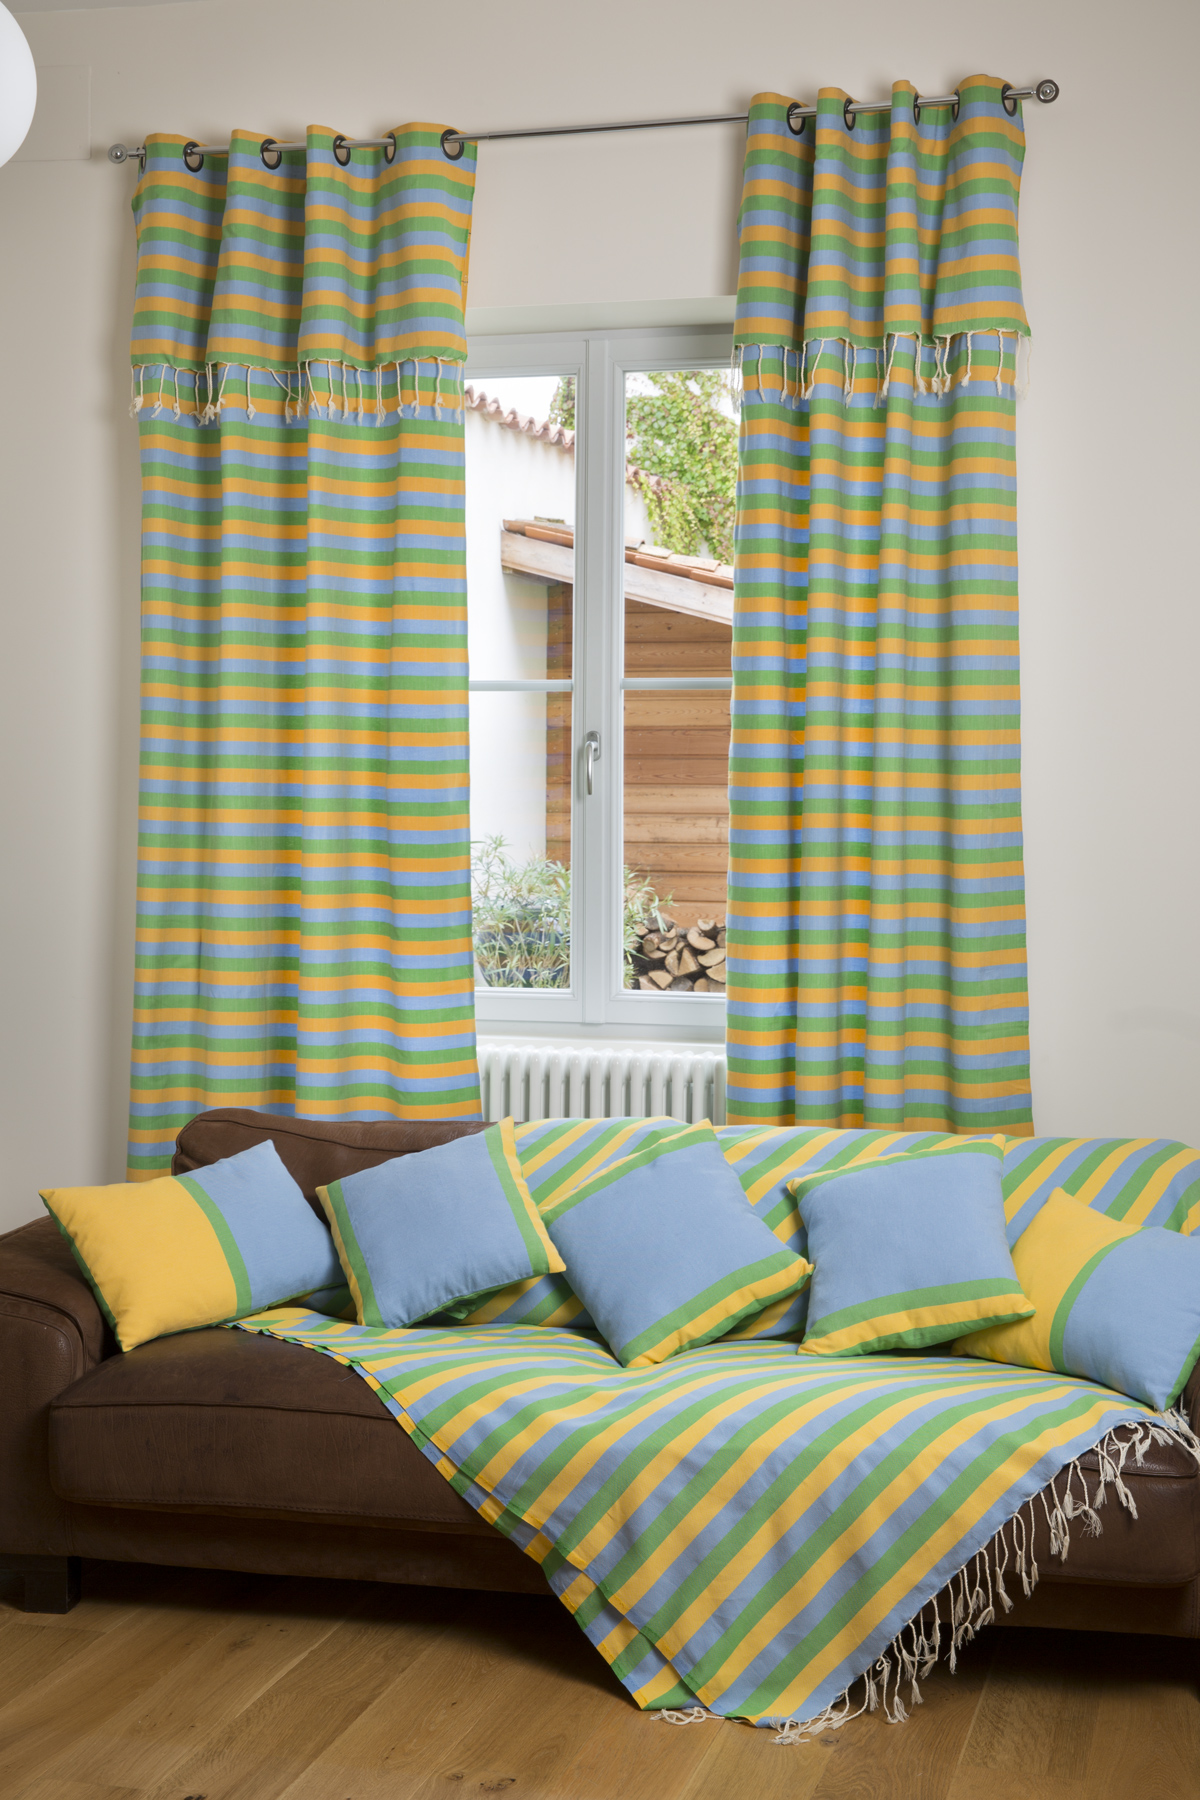 DJERBA - Rideau ajustable coton jaune turquoise vert 140 x 210 à 240